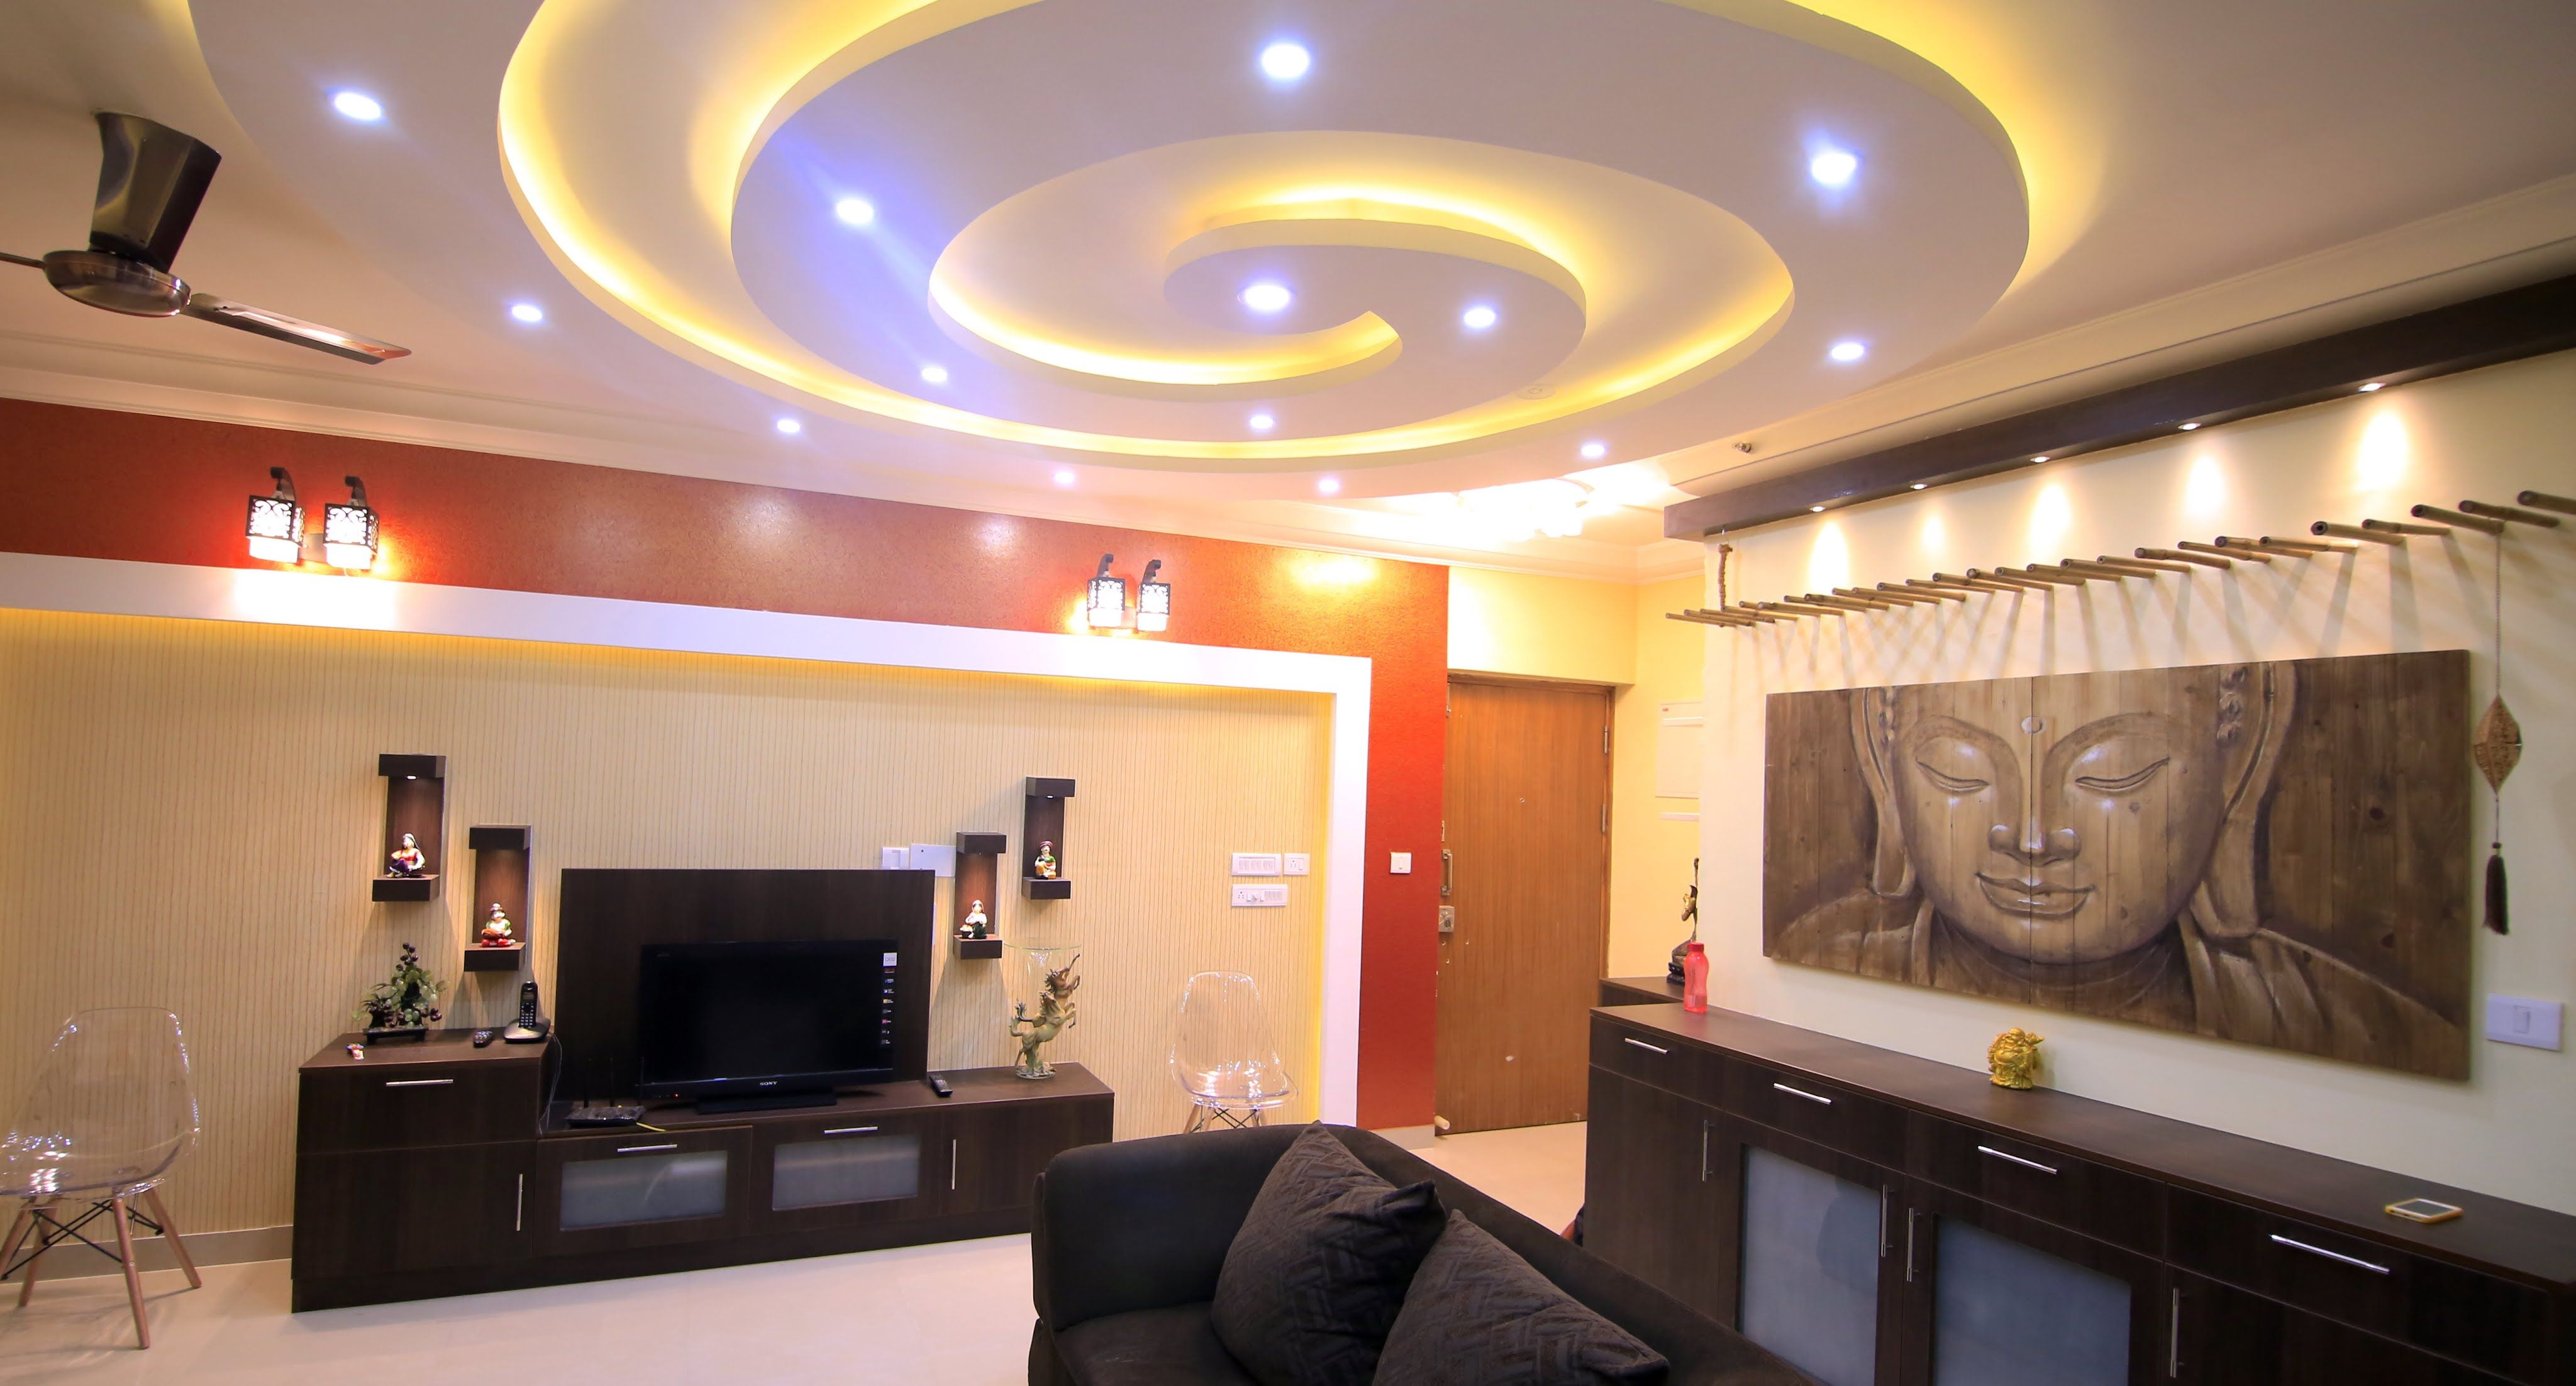 A Walk Through The Interiors Of Salarpuria Senorita Apartment Sandeep And Vaishali Sarjapura RoadBangalore Design This Foyer Has Stunning View